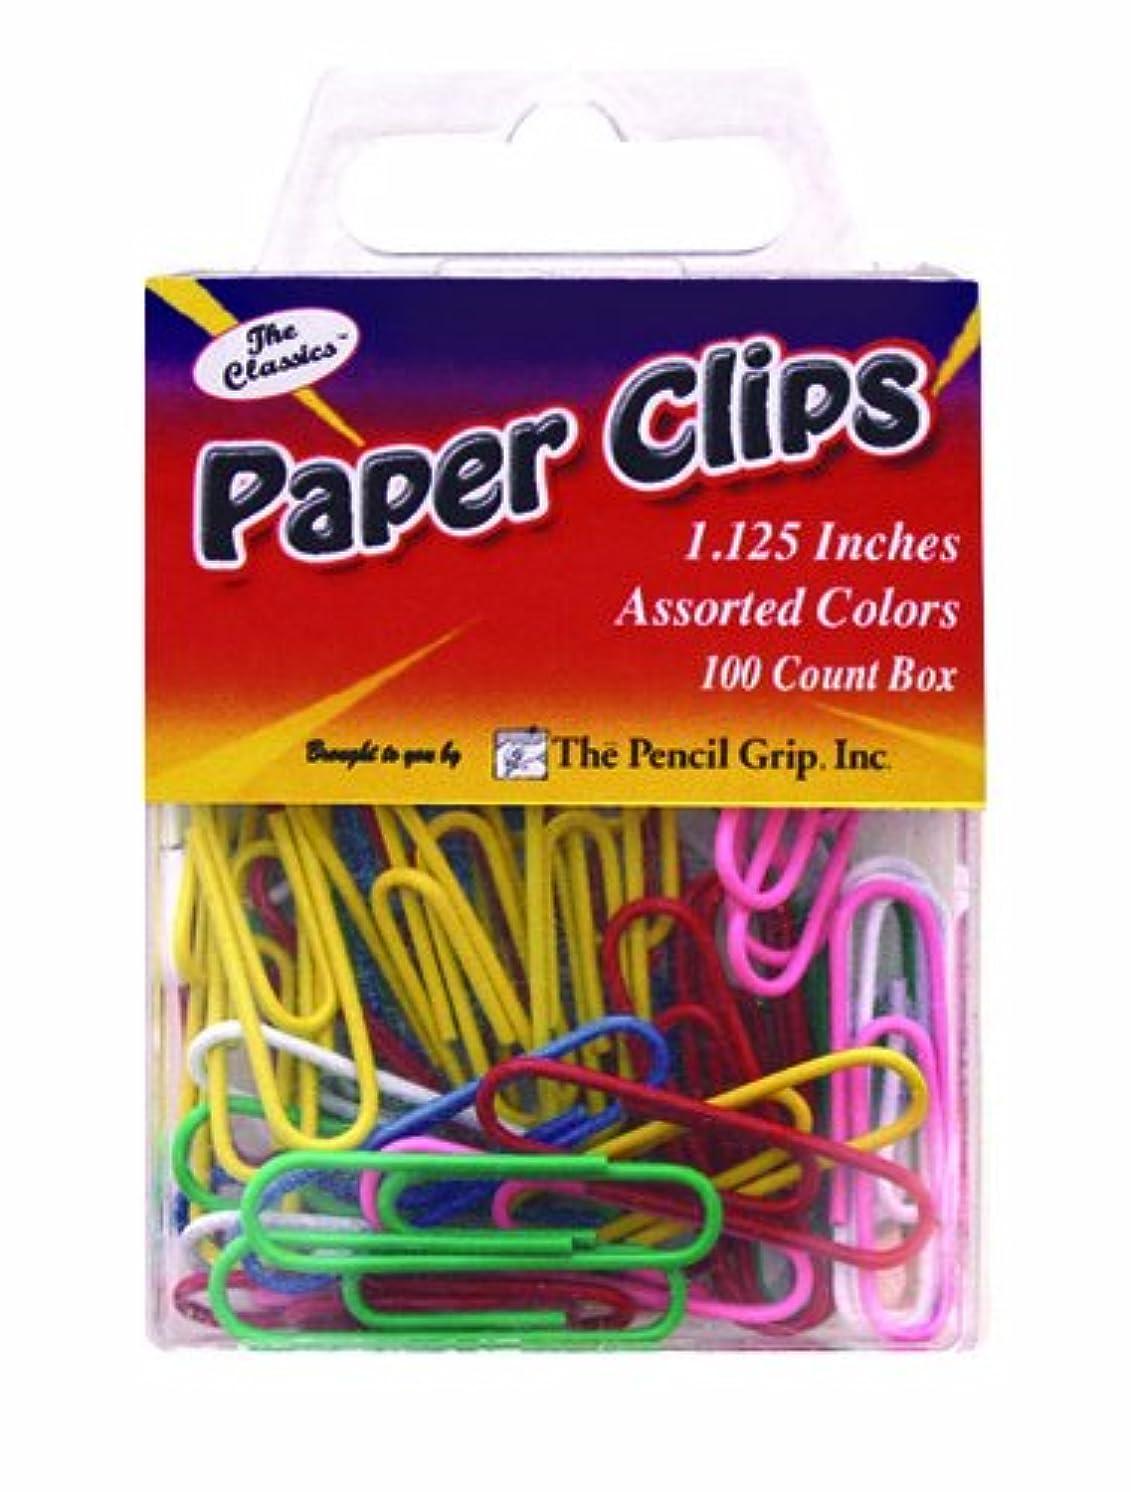 Pencil Grip The Classics 1.125 Inch Paper Clips, Assorted Colors, 100 Clips per Box, 6 Boxes per Pack (TPG-22306)